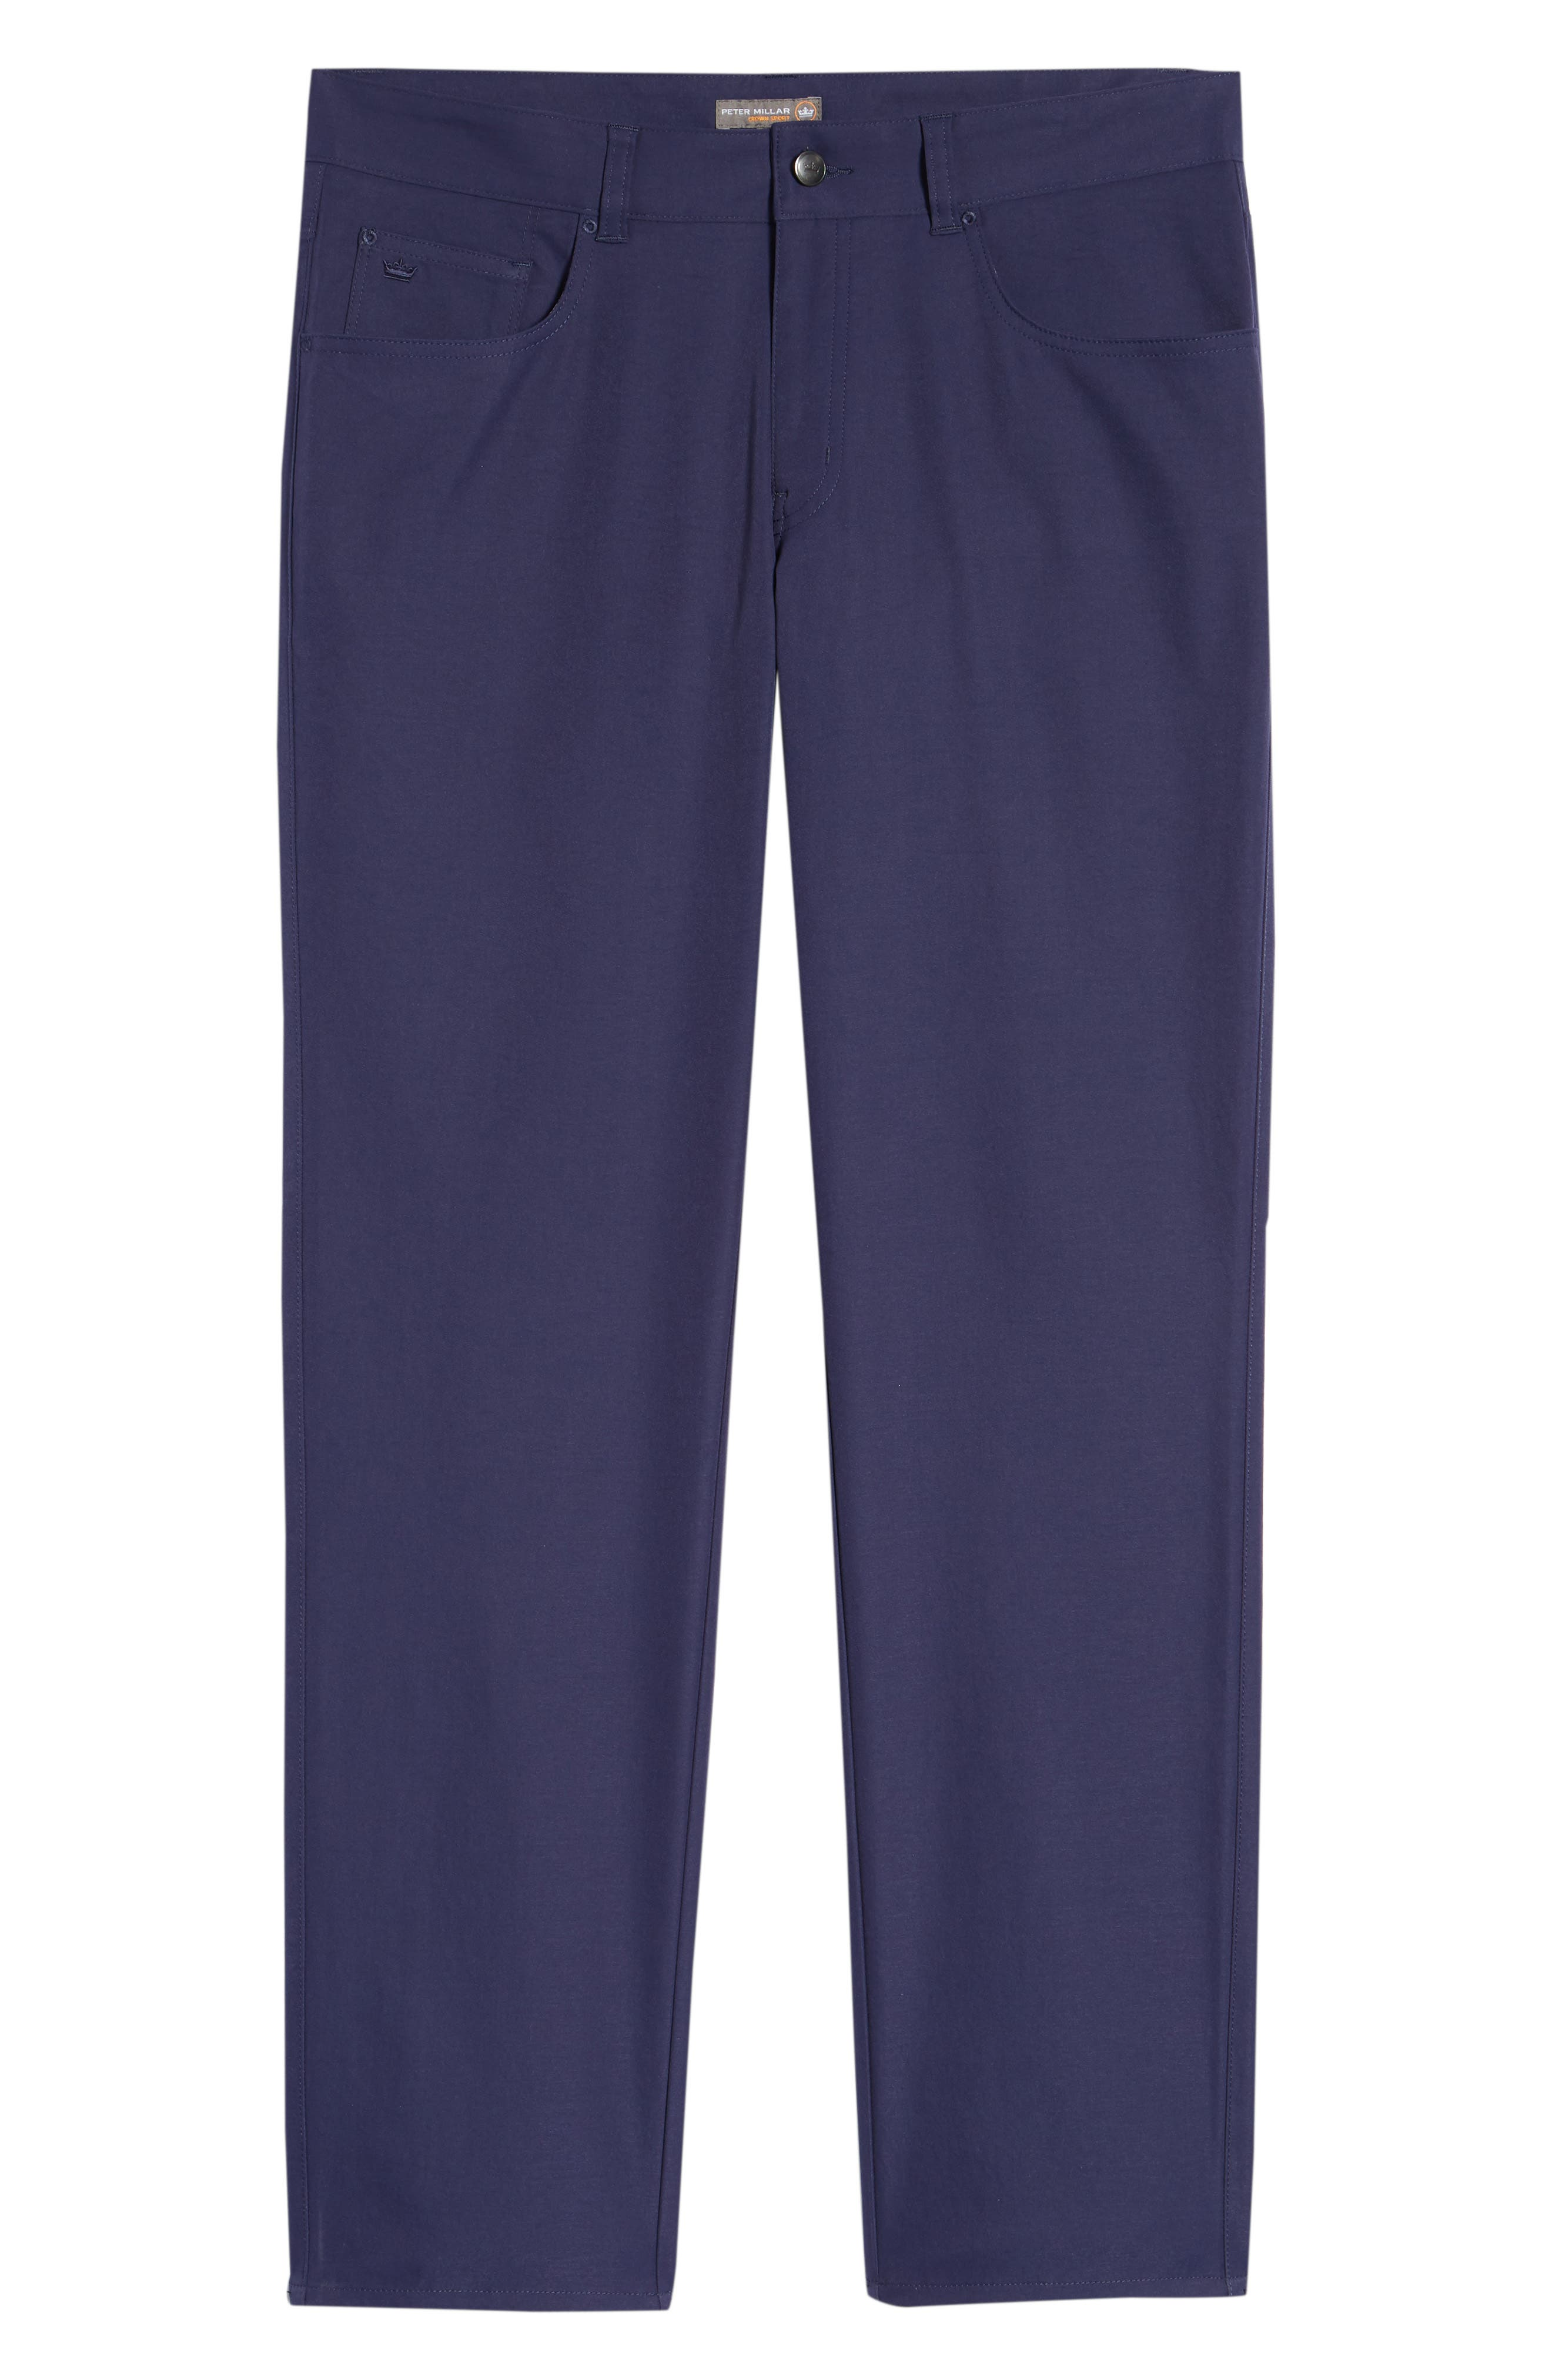 EB66 Performance Six-Pocket Pants,                             Alternate thumbnail 35, color,